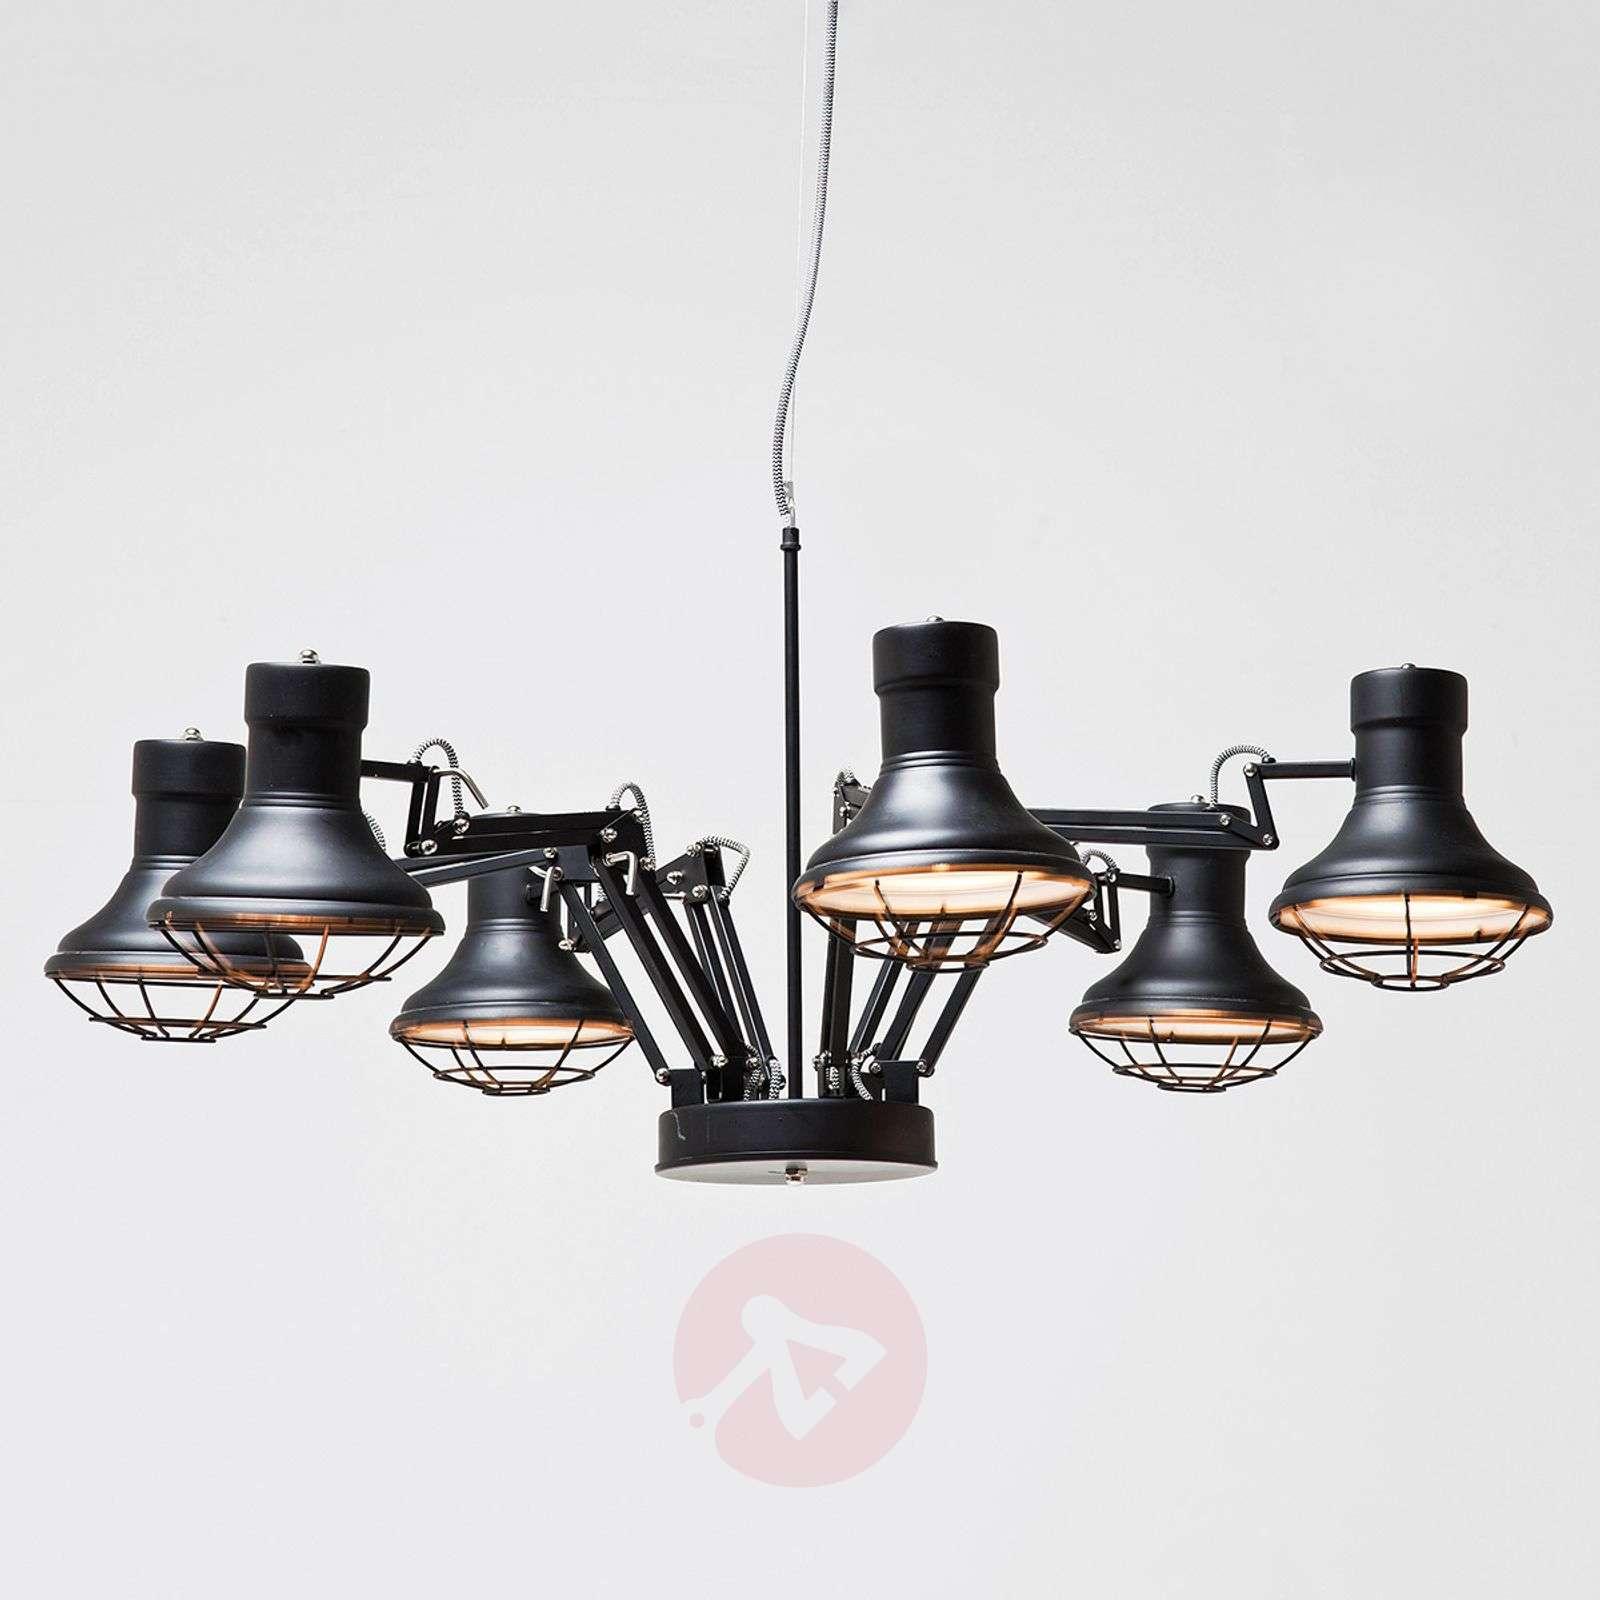 KARE Spider Multi designer hanging light-5517346-01